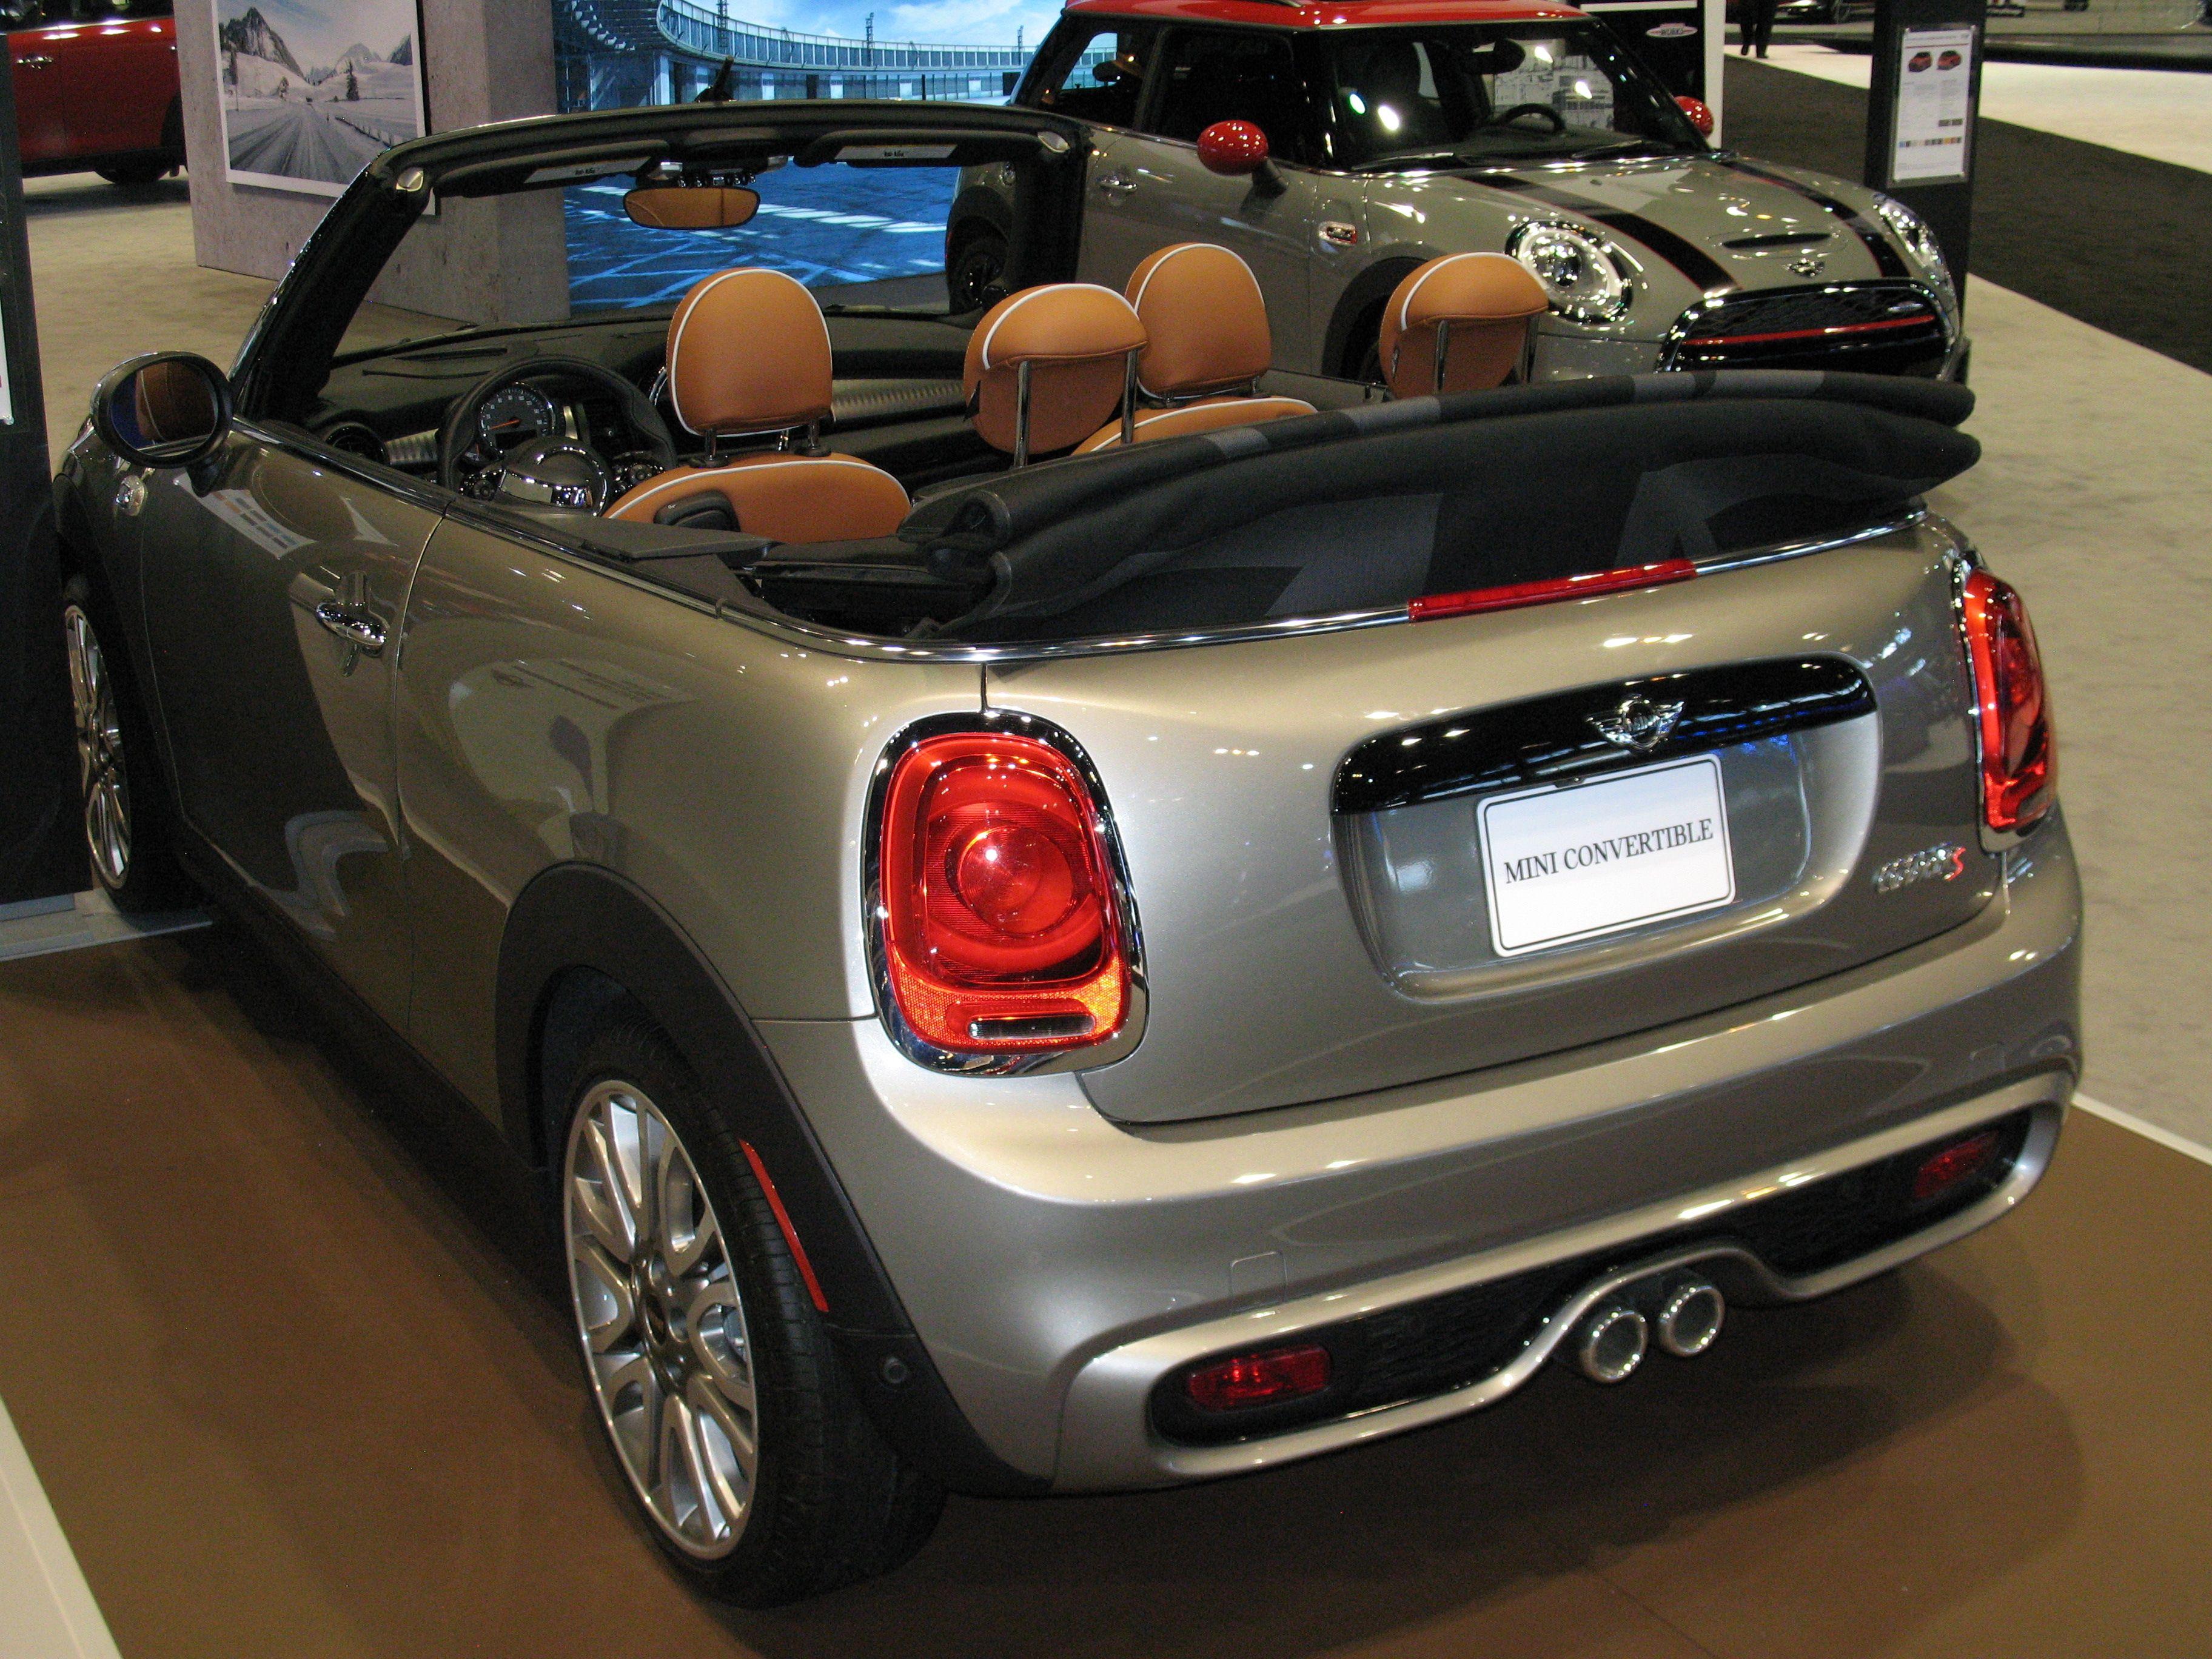 2016 Mini Cooper S Convertible 3 4 Rear View Models